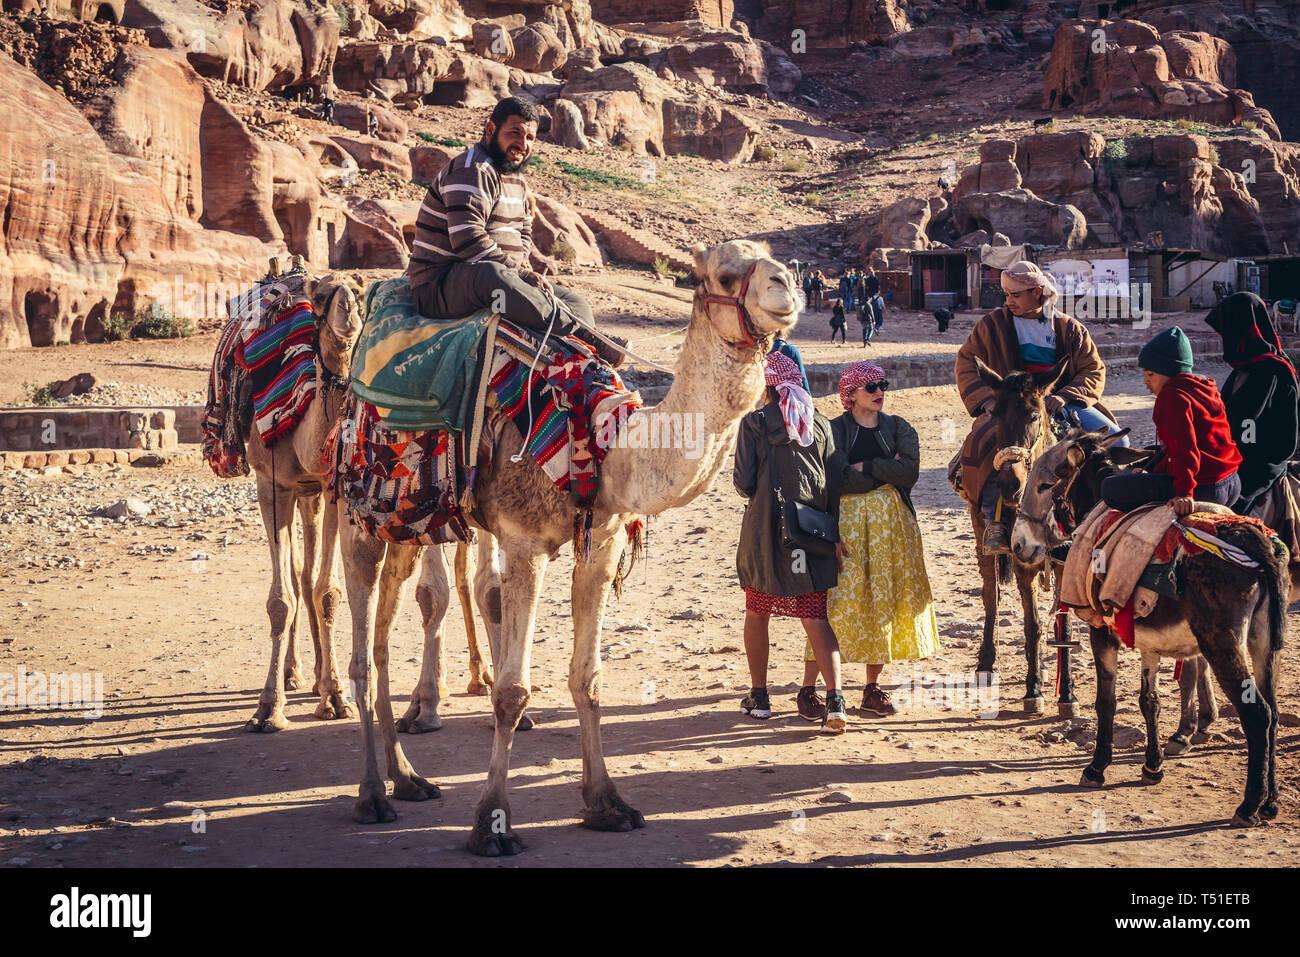 Camels in Petra historical city of Nabatean Kingdom in Jordan Stock Photo